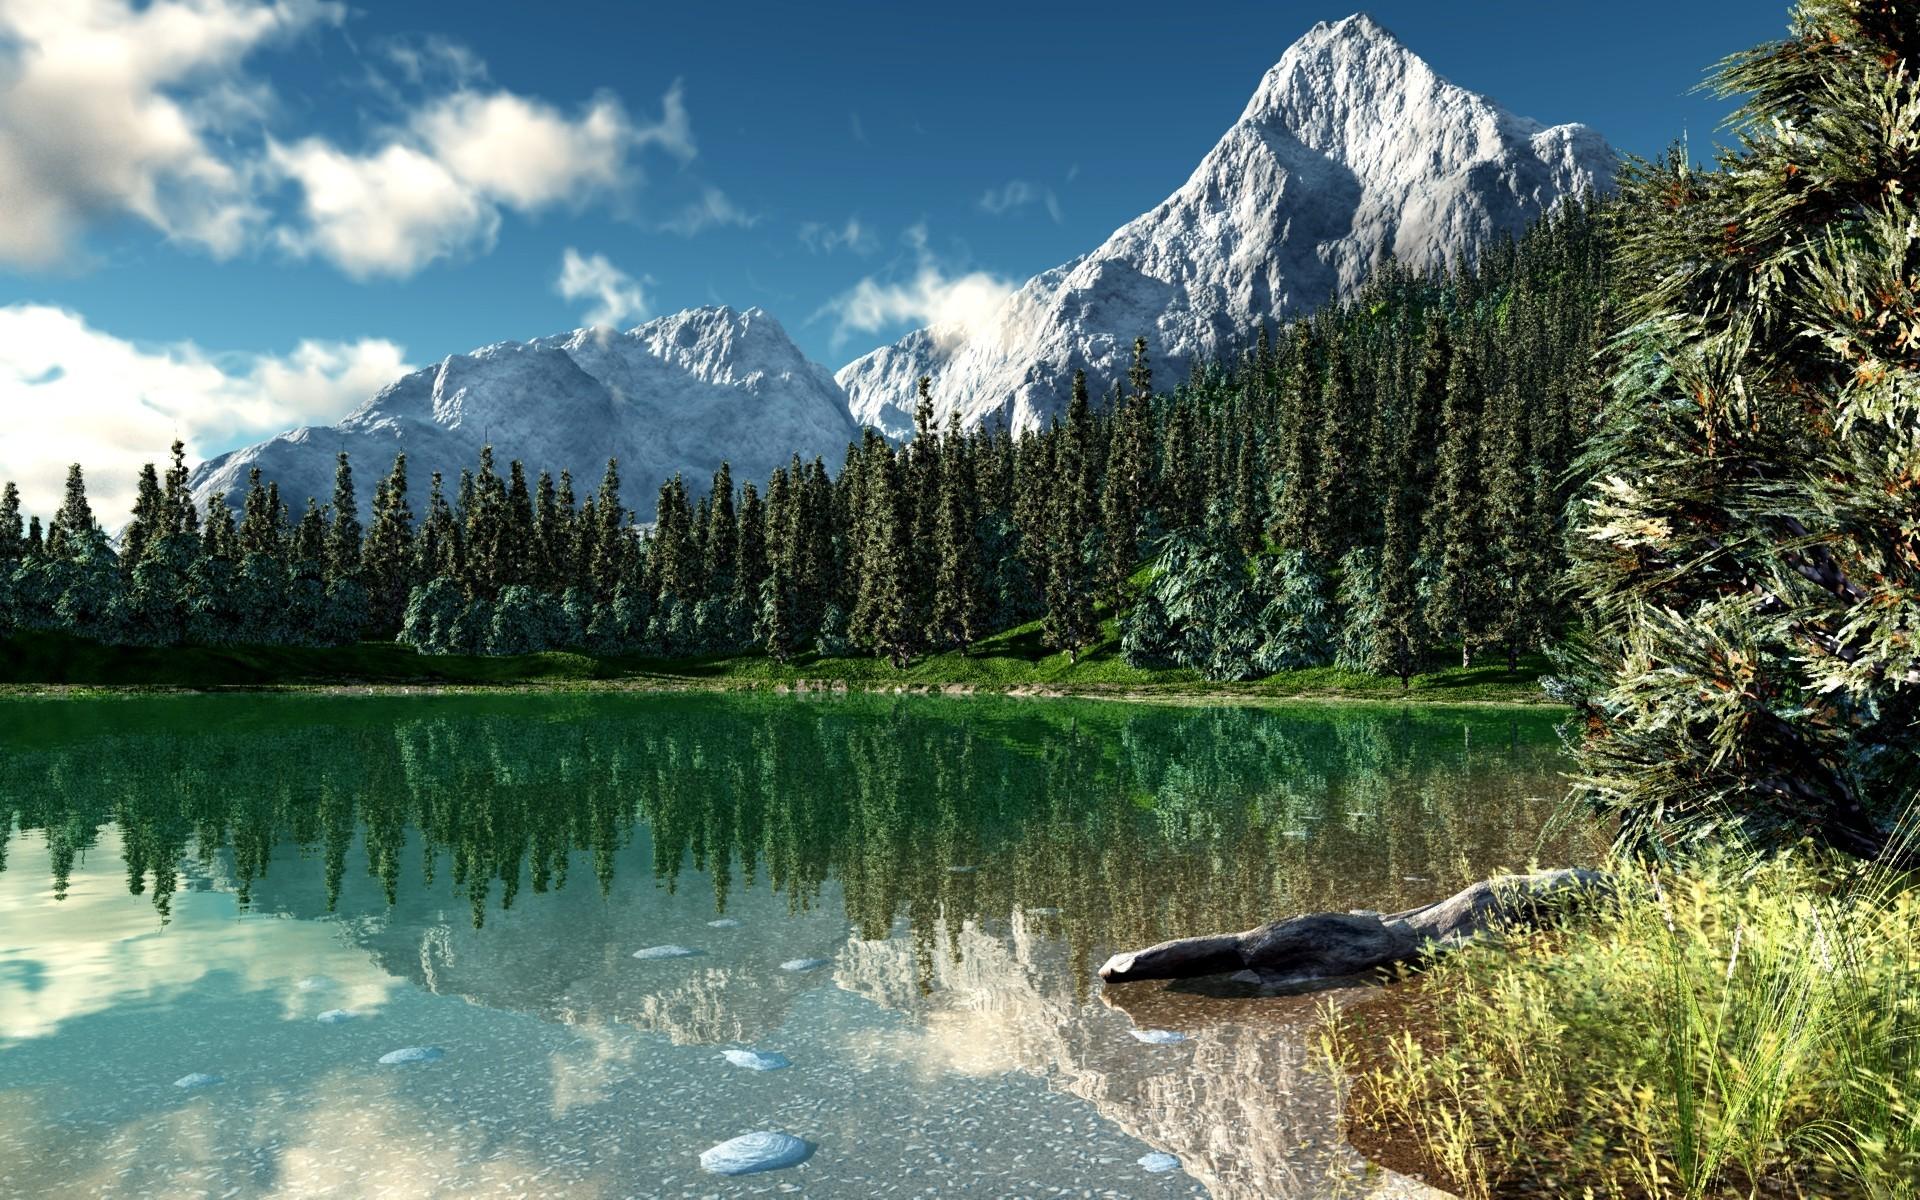 Rocky Mountain National Park wallpaper 6183 1920x1200